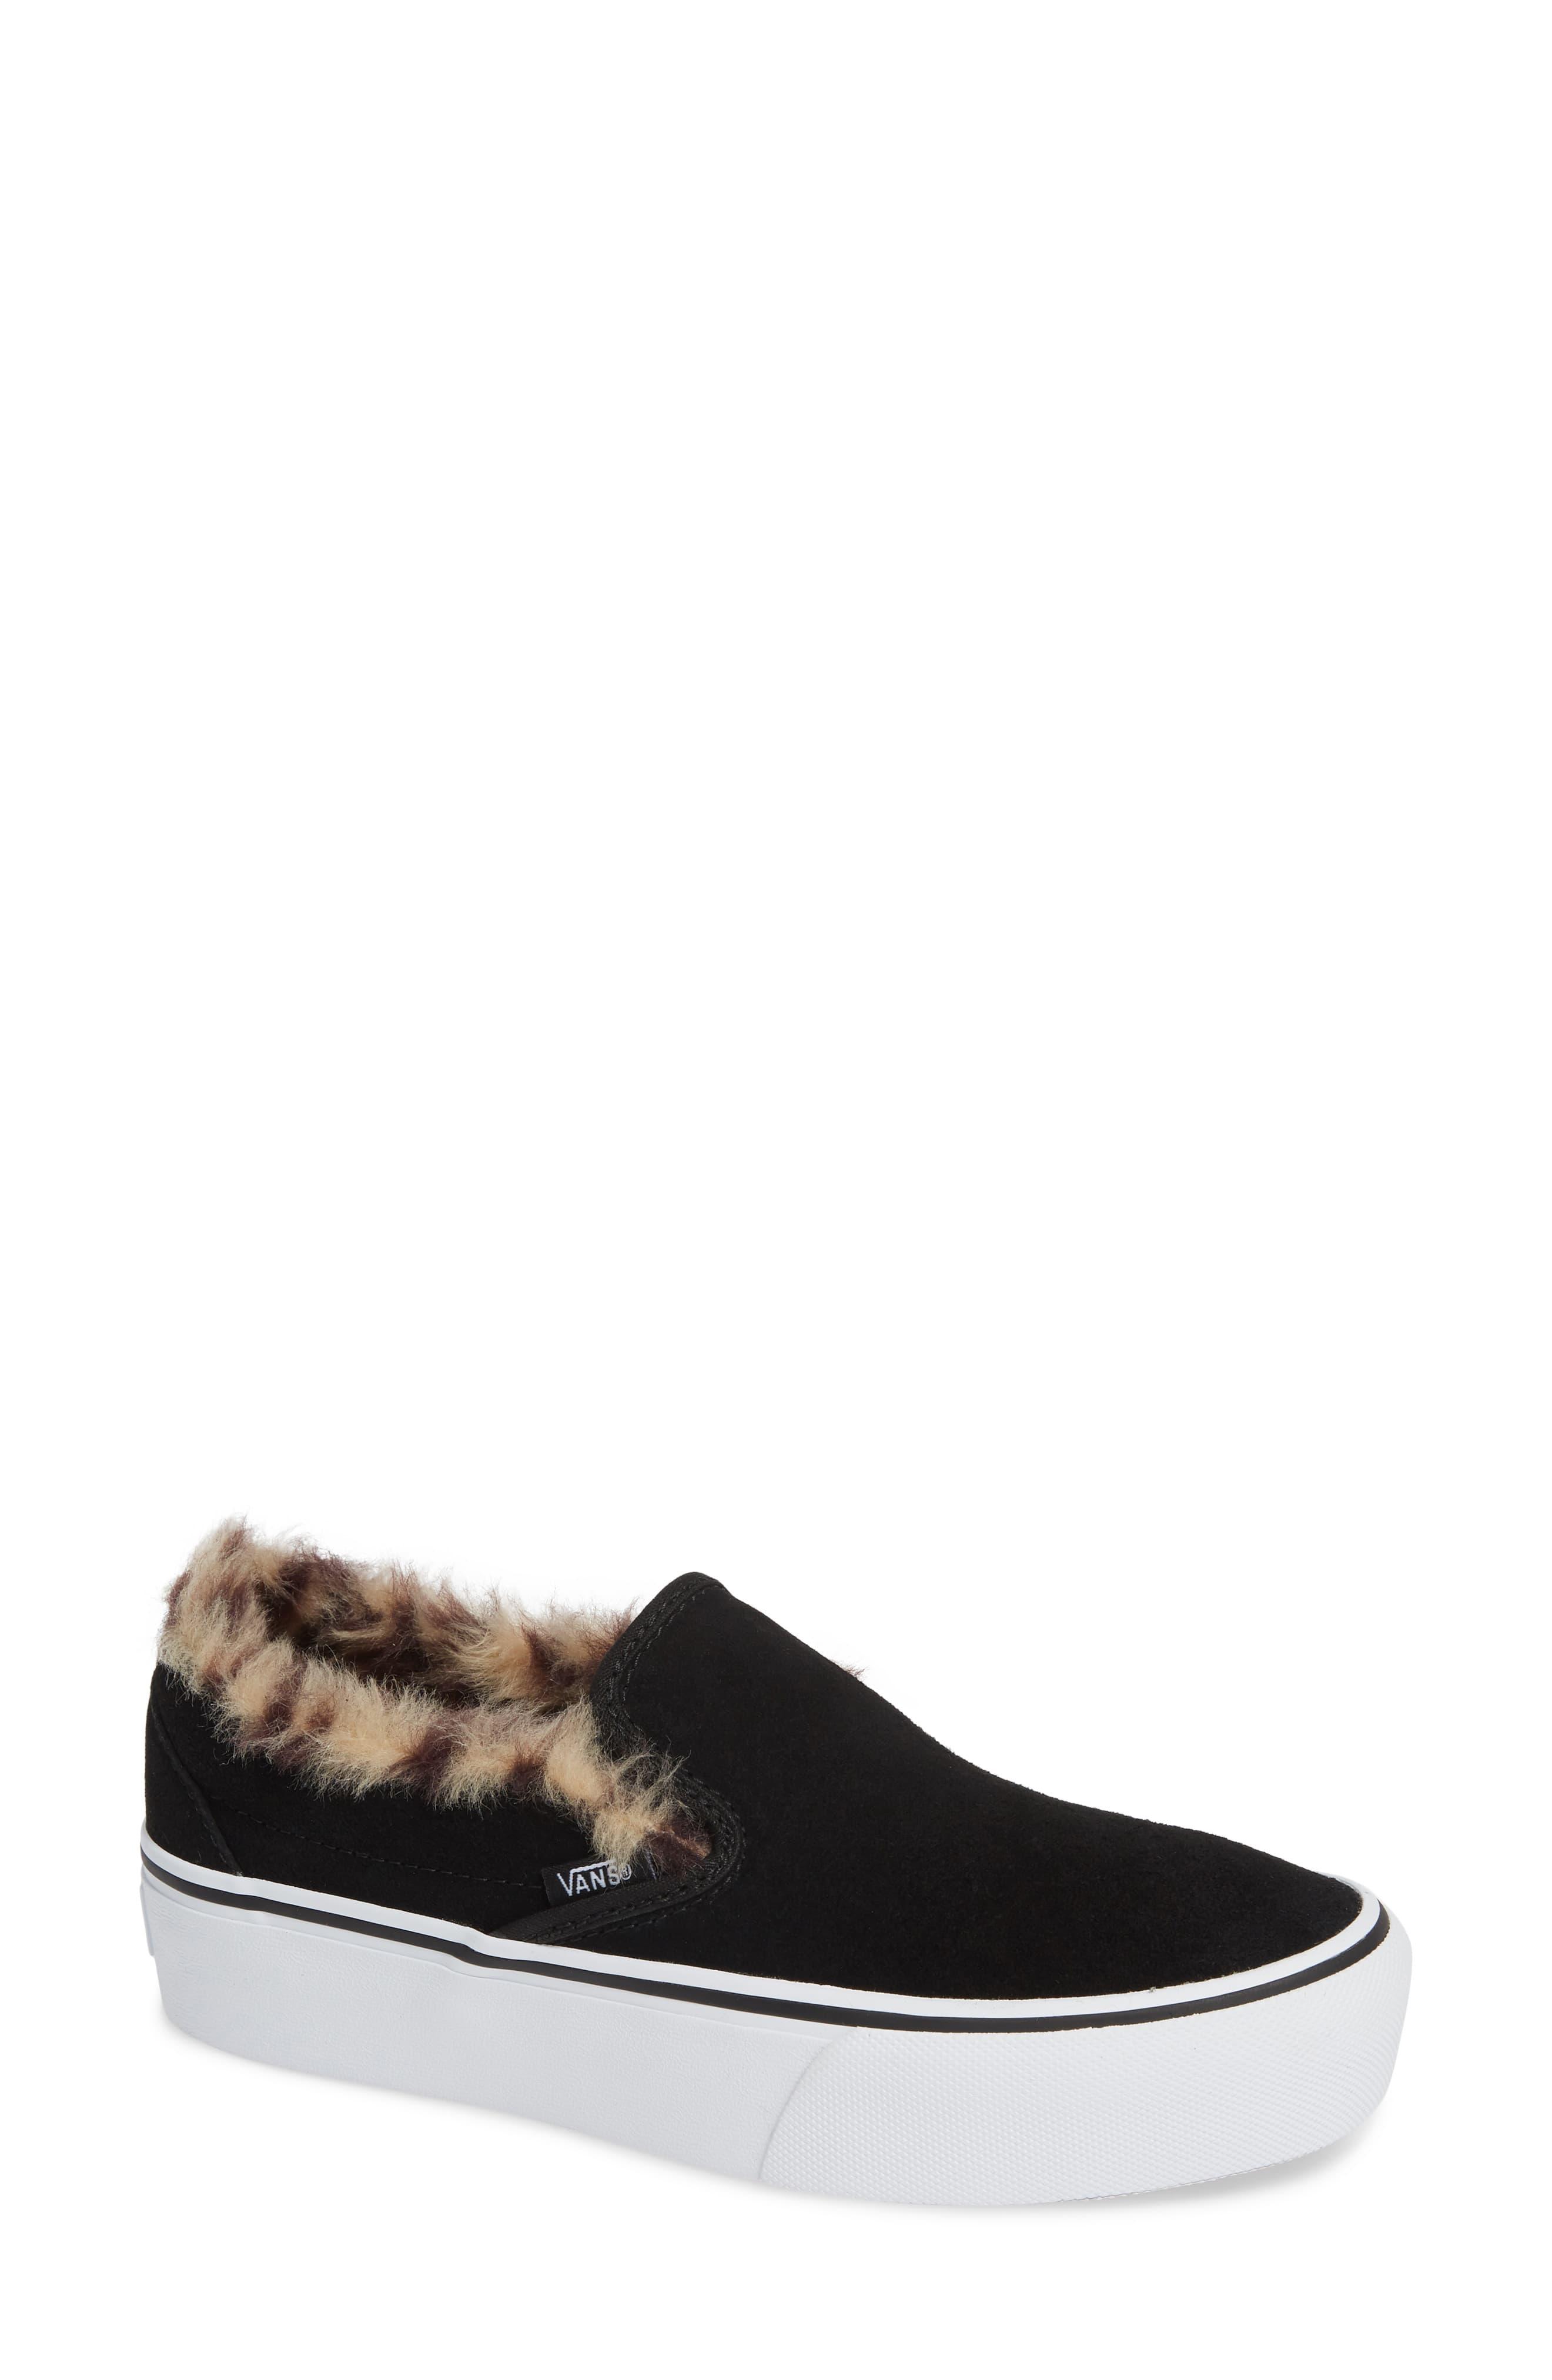 Women's Vans Classic Faux Fur Slip-On Platform Sneaker, Size 9.5 M ...